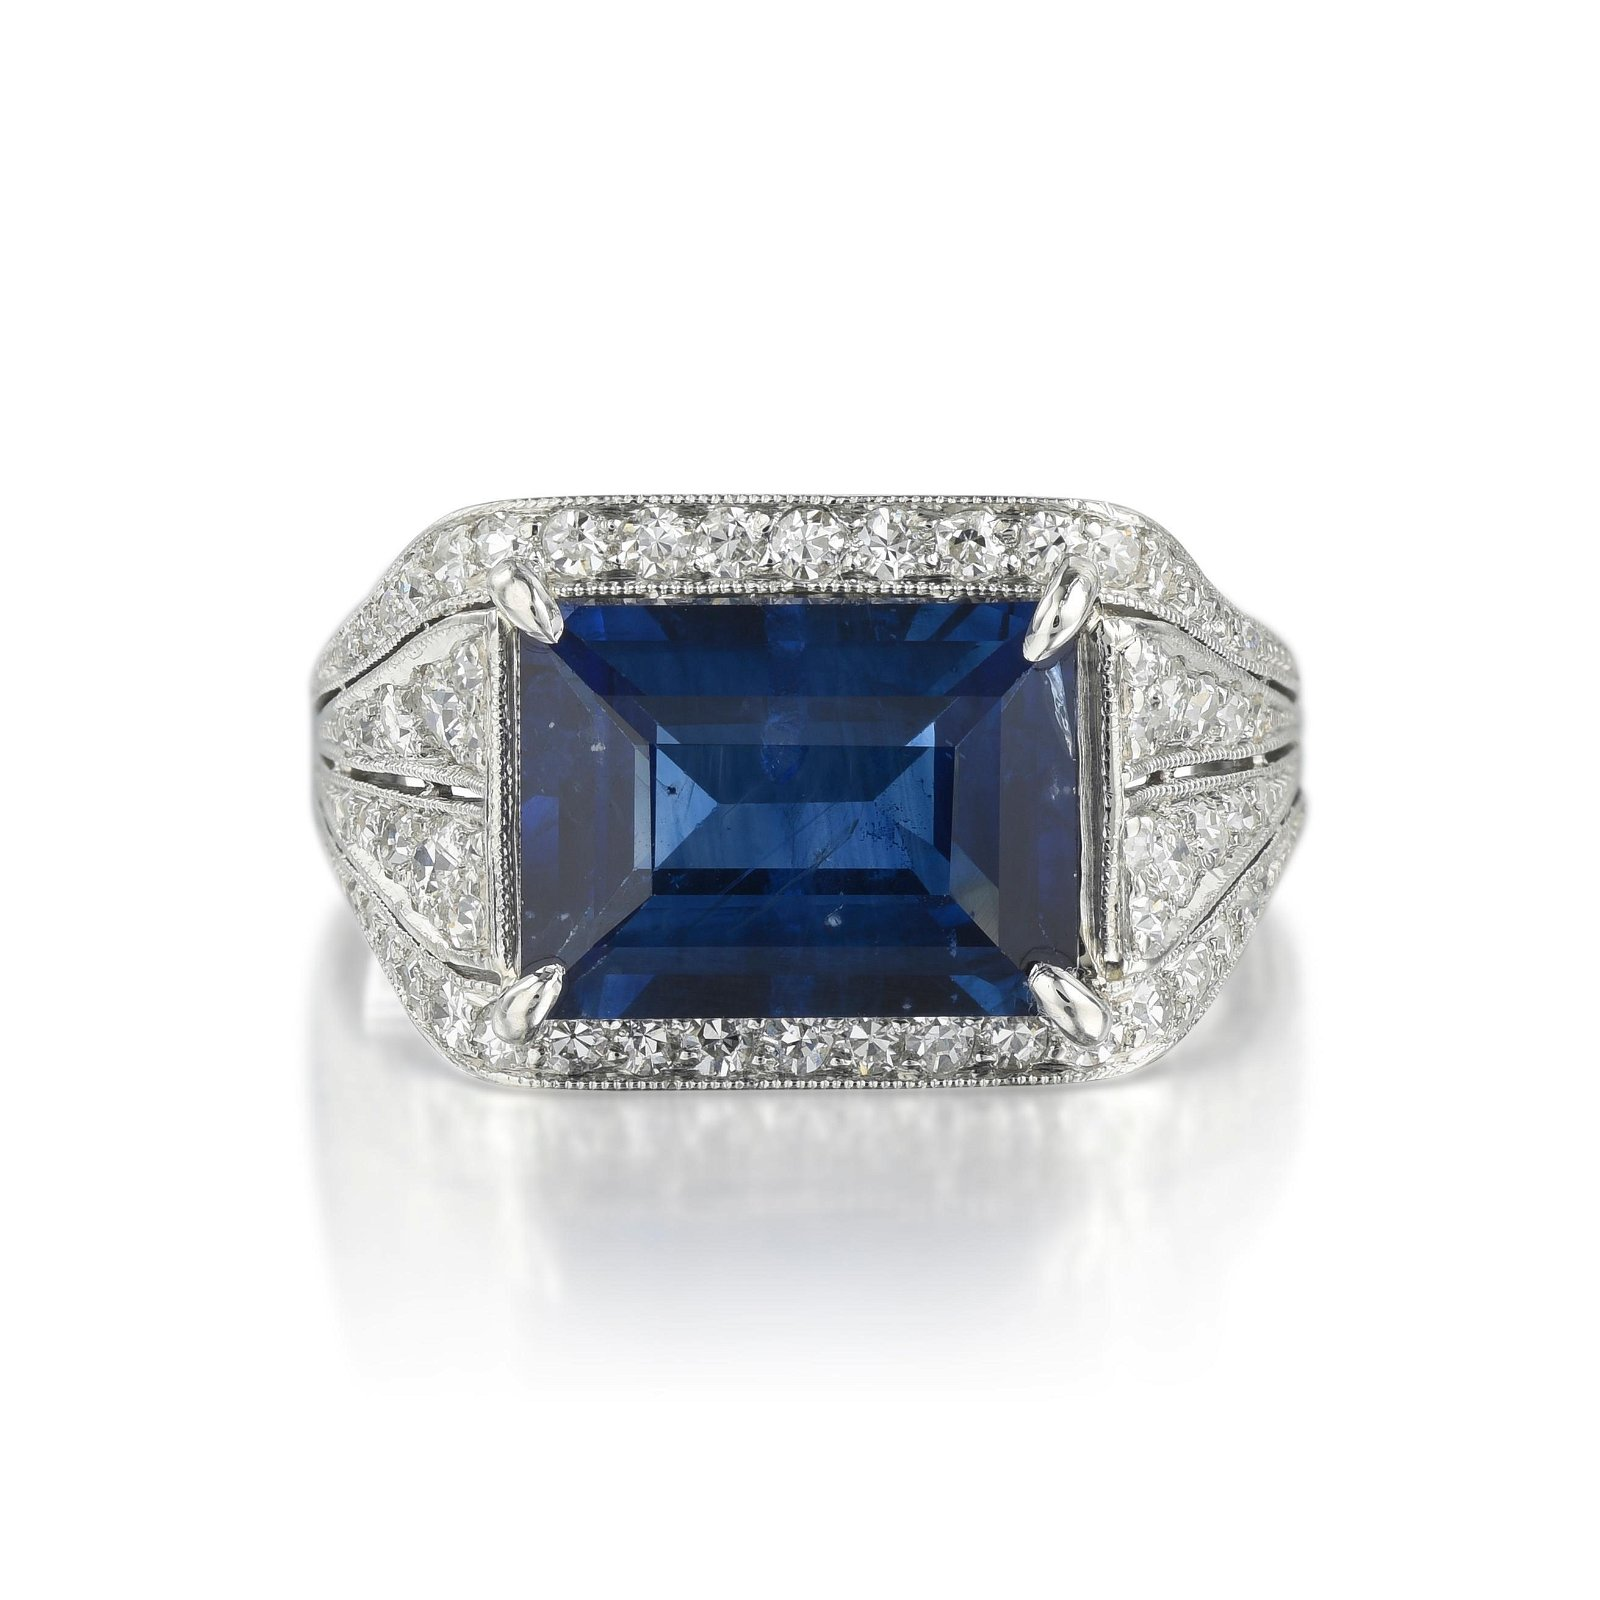 J.E. Caldwell Art Deco Sapphire and Diamond Ring